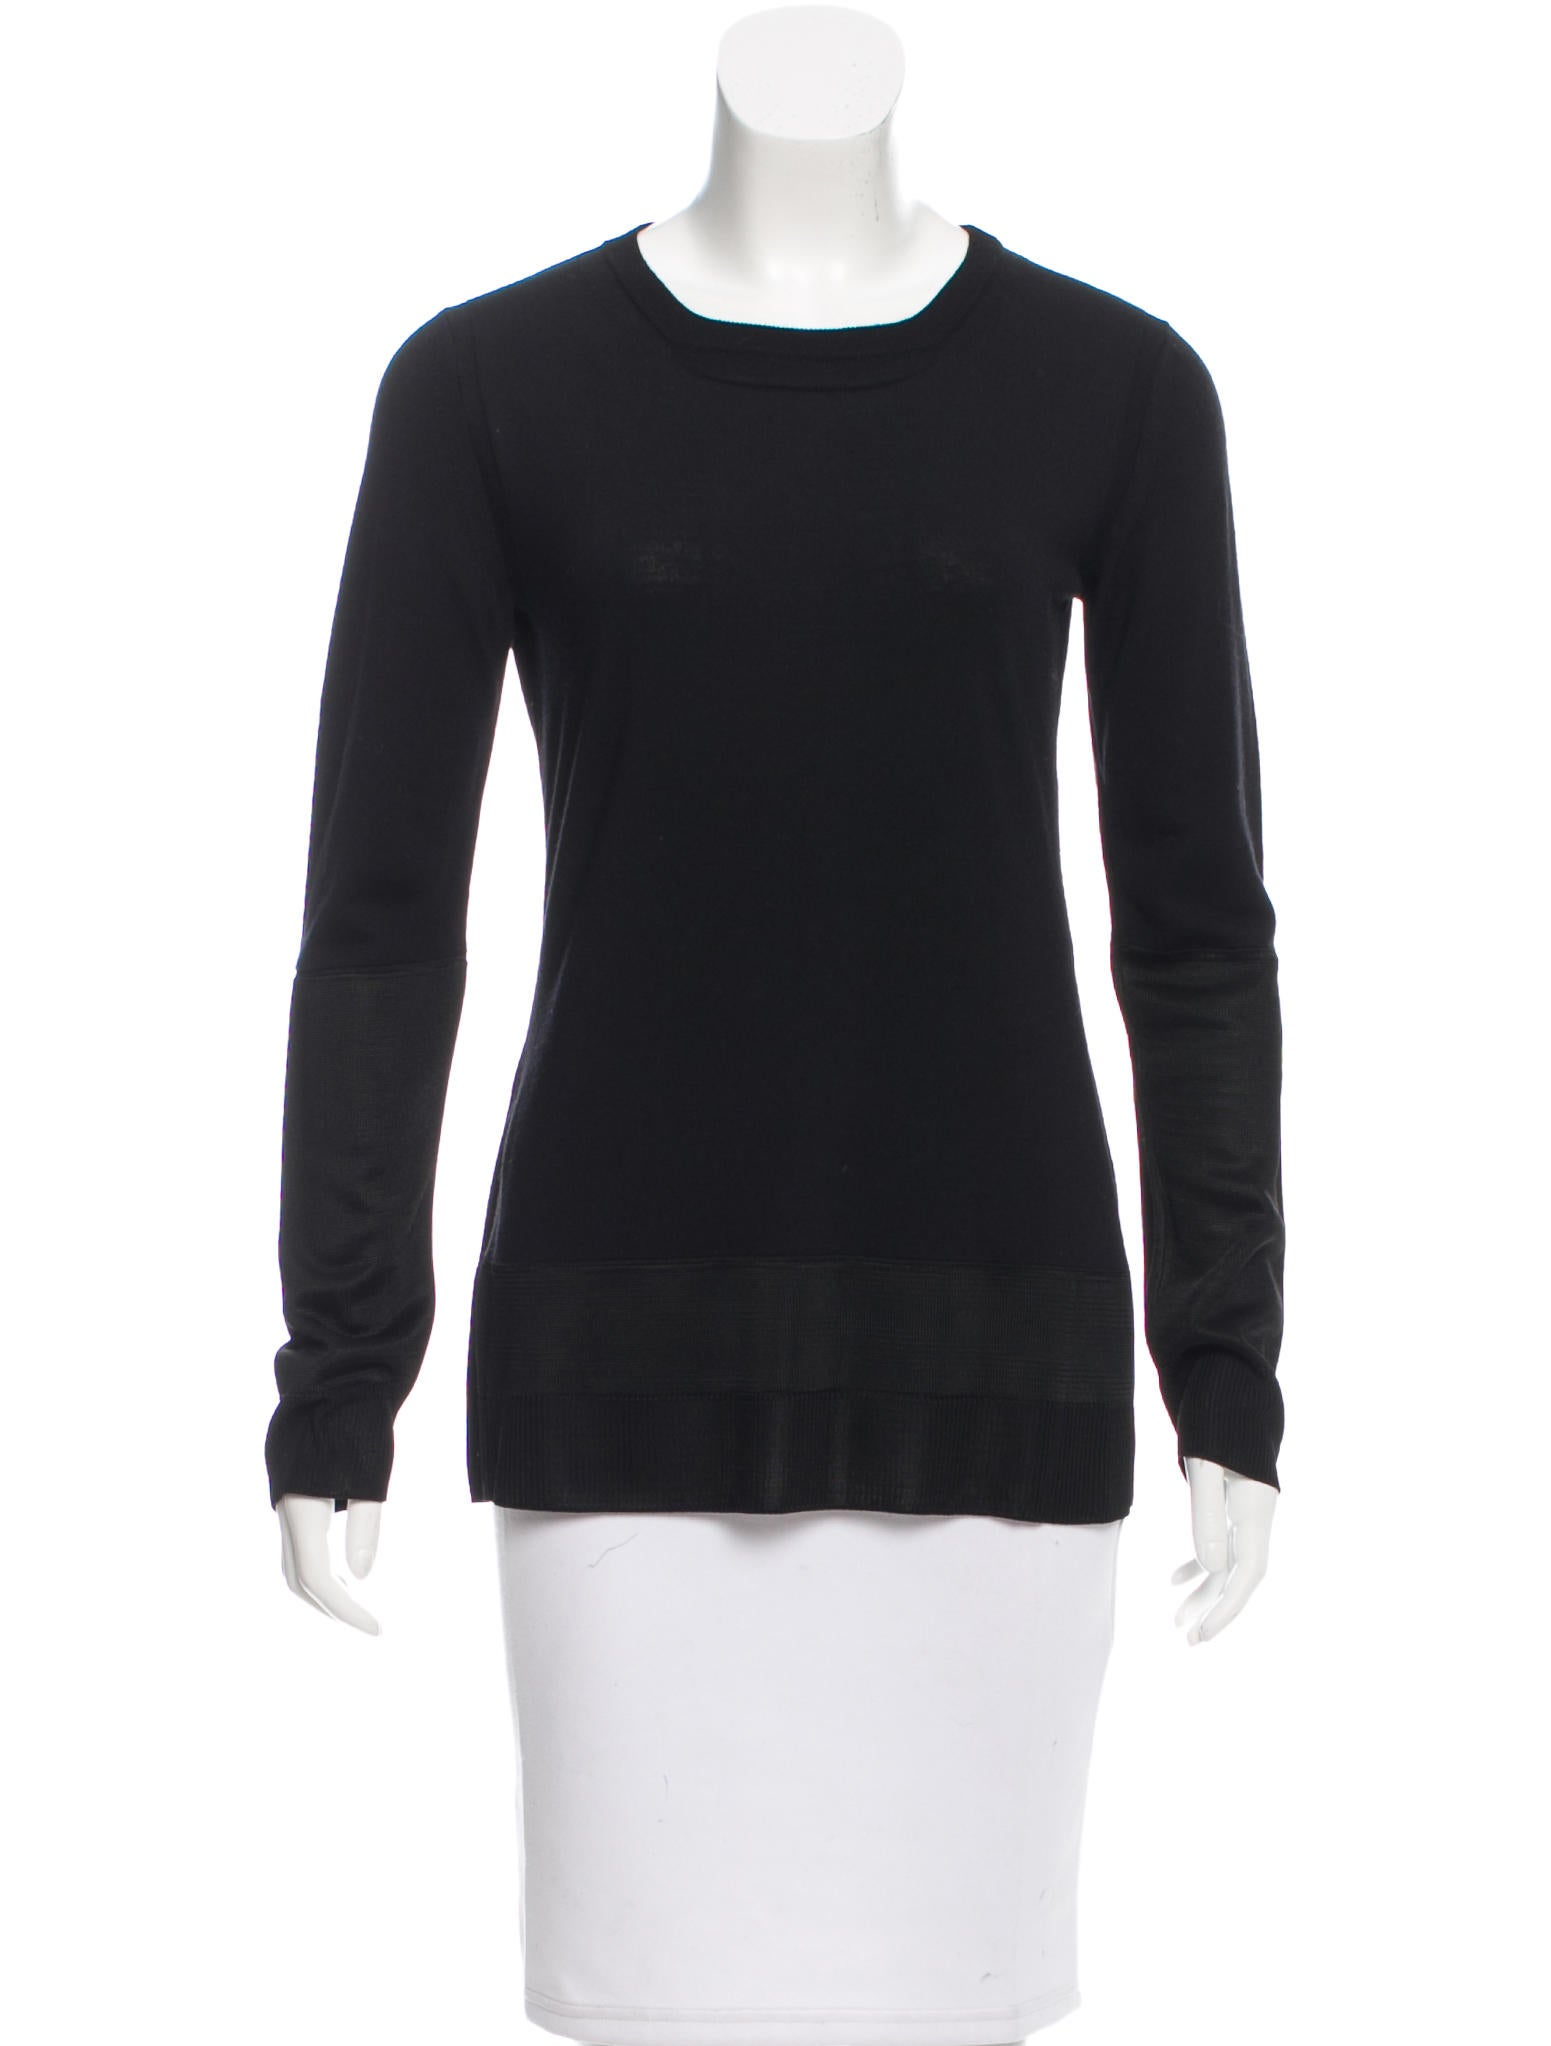 Balenciaga wool blend knit top clothing bal42990 the for Best wool shirt jackets